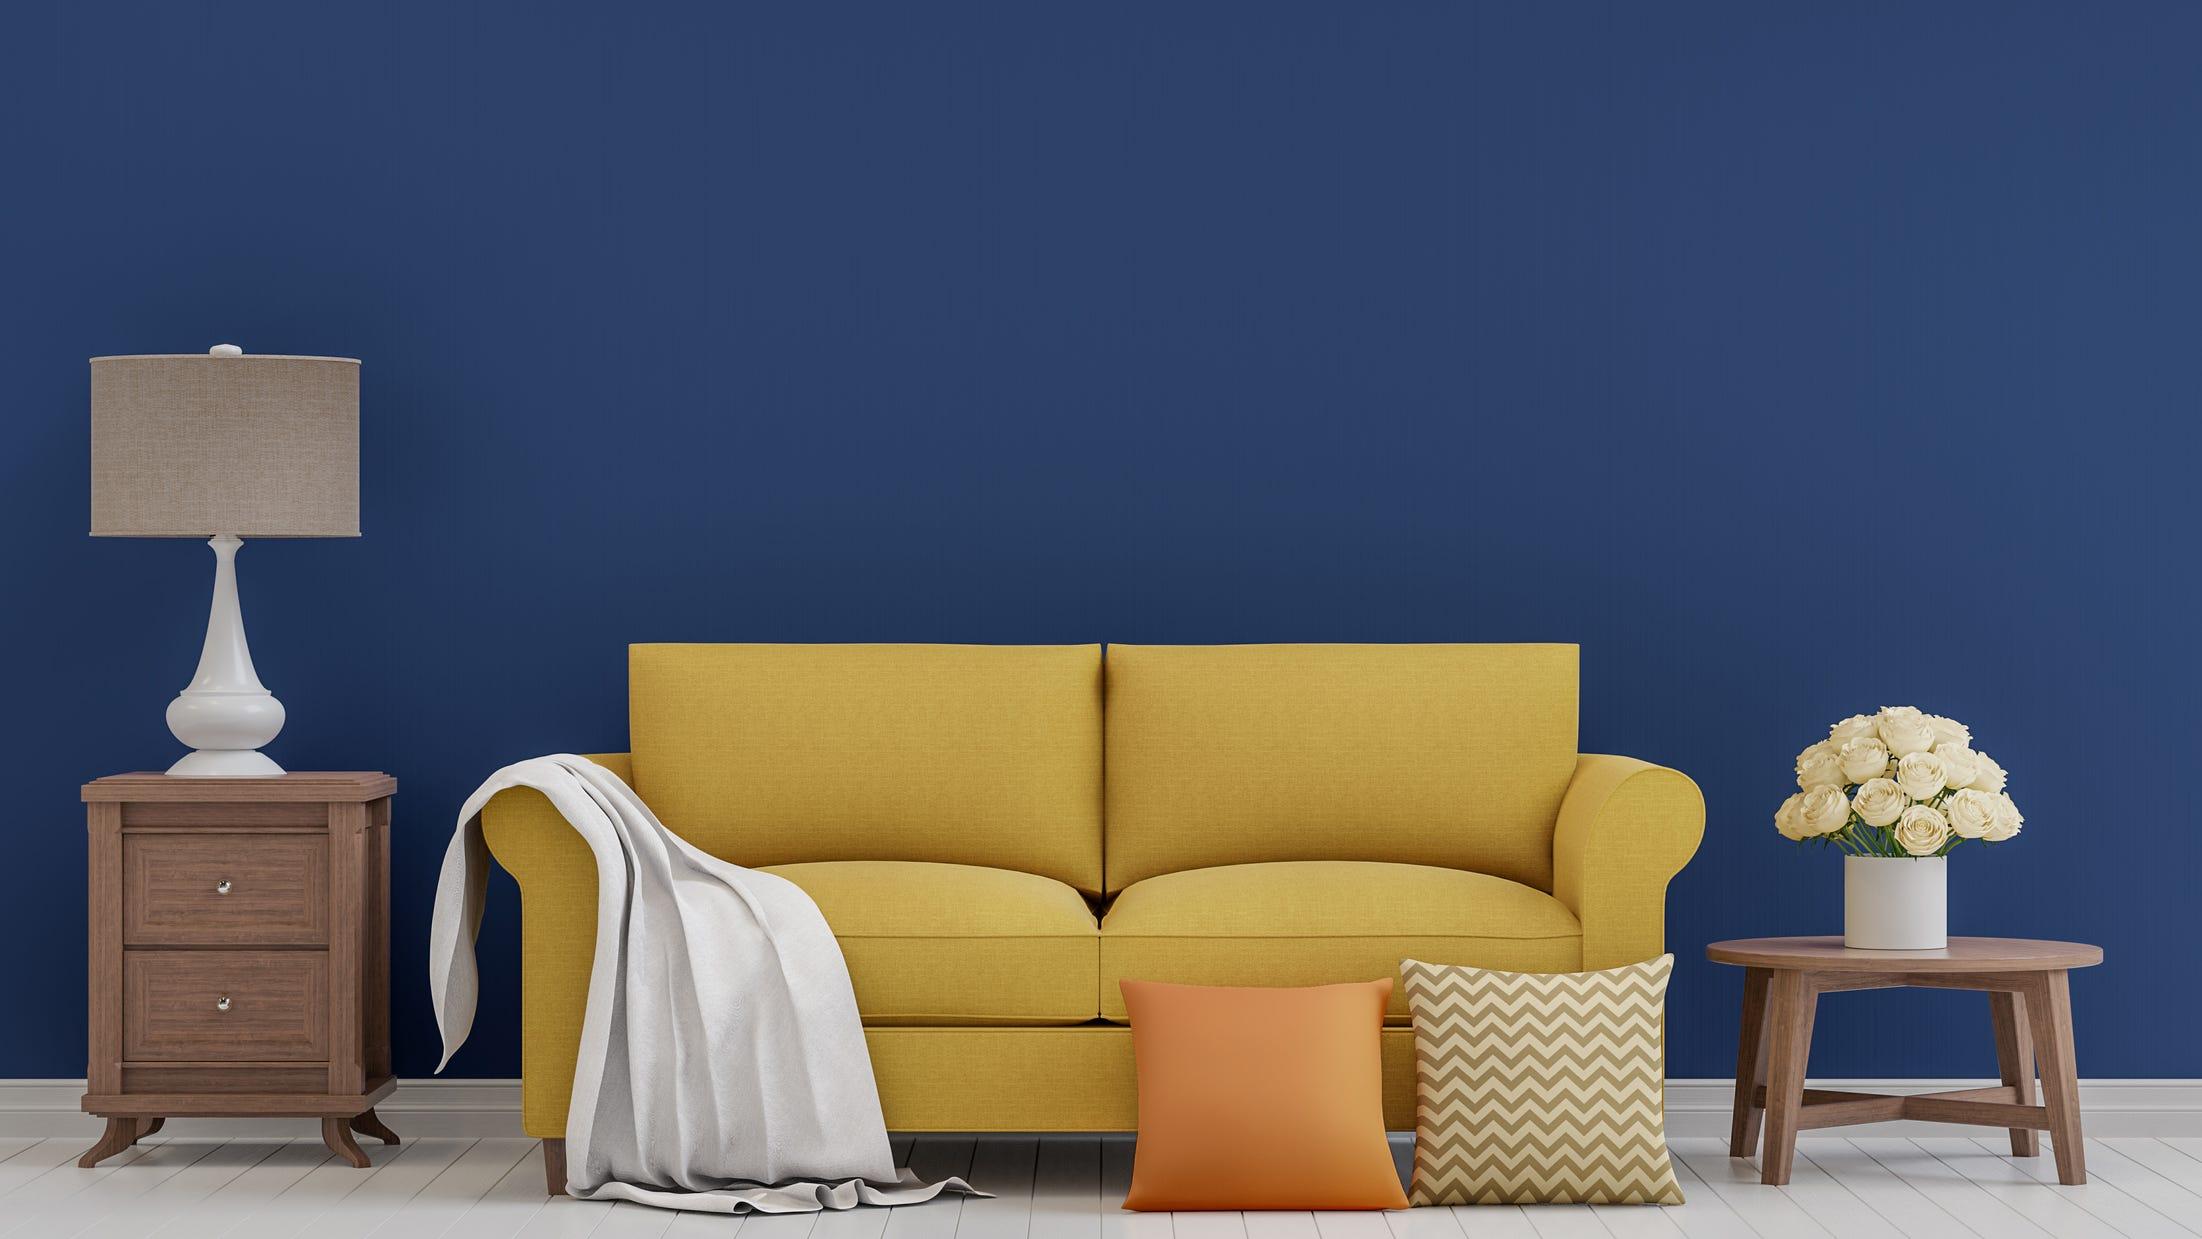 Cyber Monday 2018: Best Furniture Sales